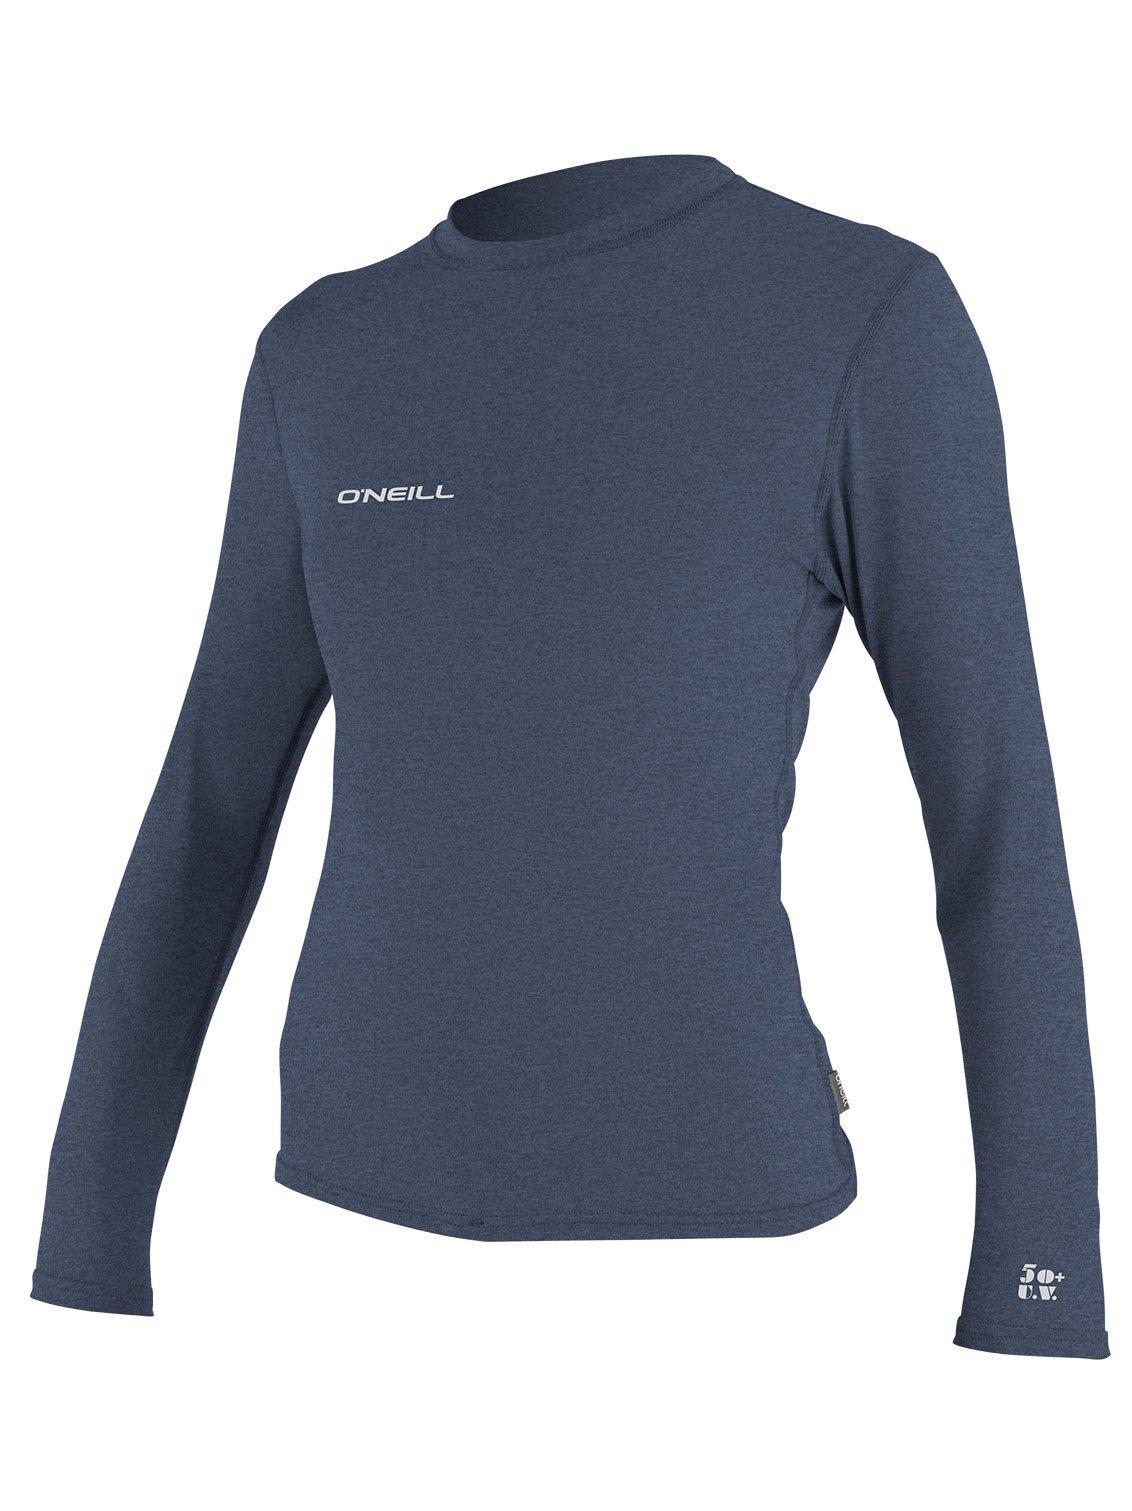 O'Neill Women's Hybrid UPF 50+ Long Sleeve Sun Shirt, Mist, Large by O'Neill Wetsuits